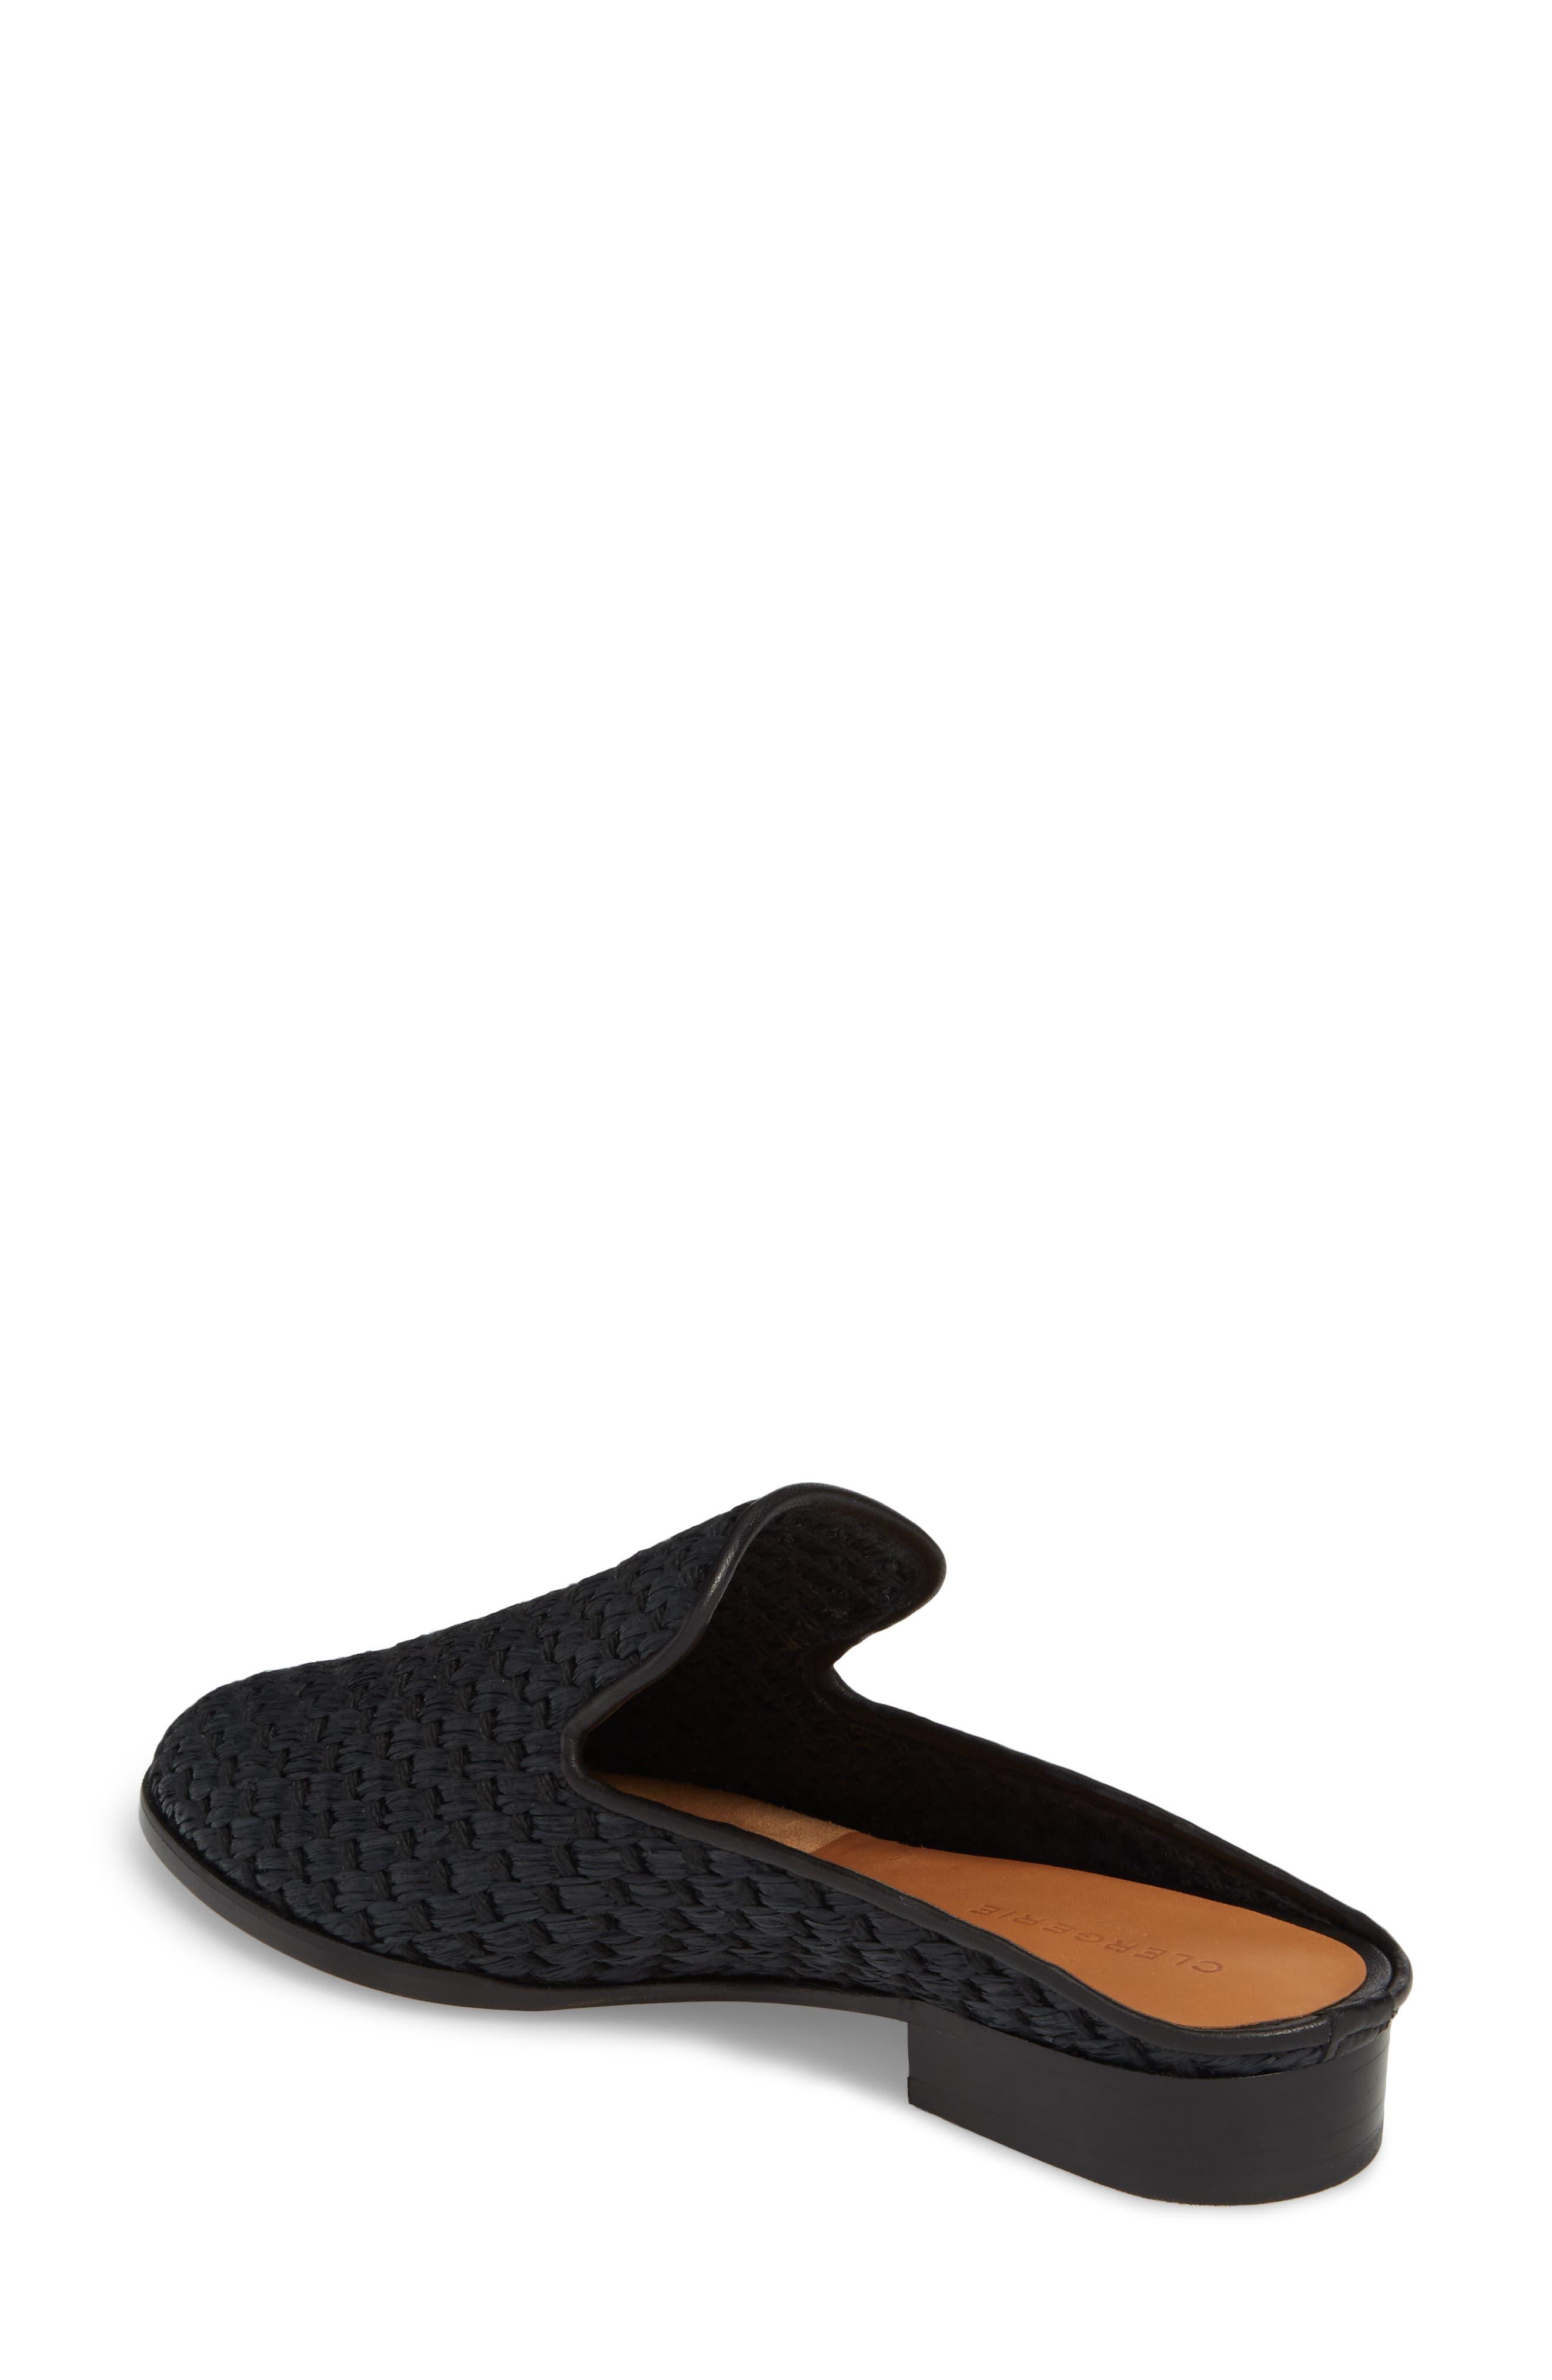 Aliceop Woven Loafer Mule,                             Alternate thumbnail 2, color,                             Black